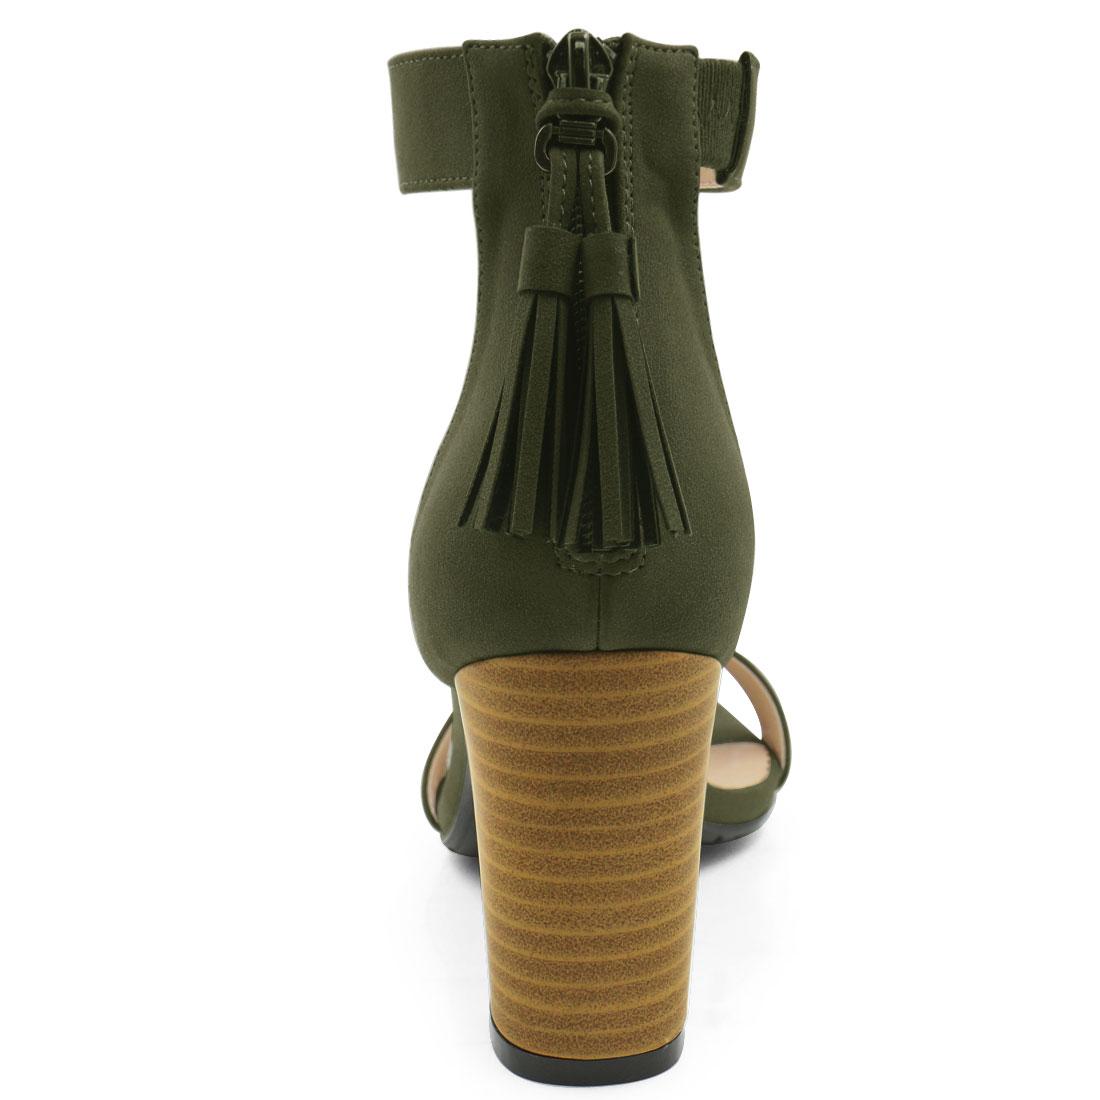 83897be40048 Unique Bargains Women s Open Toe Tassel Stacked Heel Ankle Strap Sandals  Khaki Green (Size 7